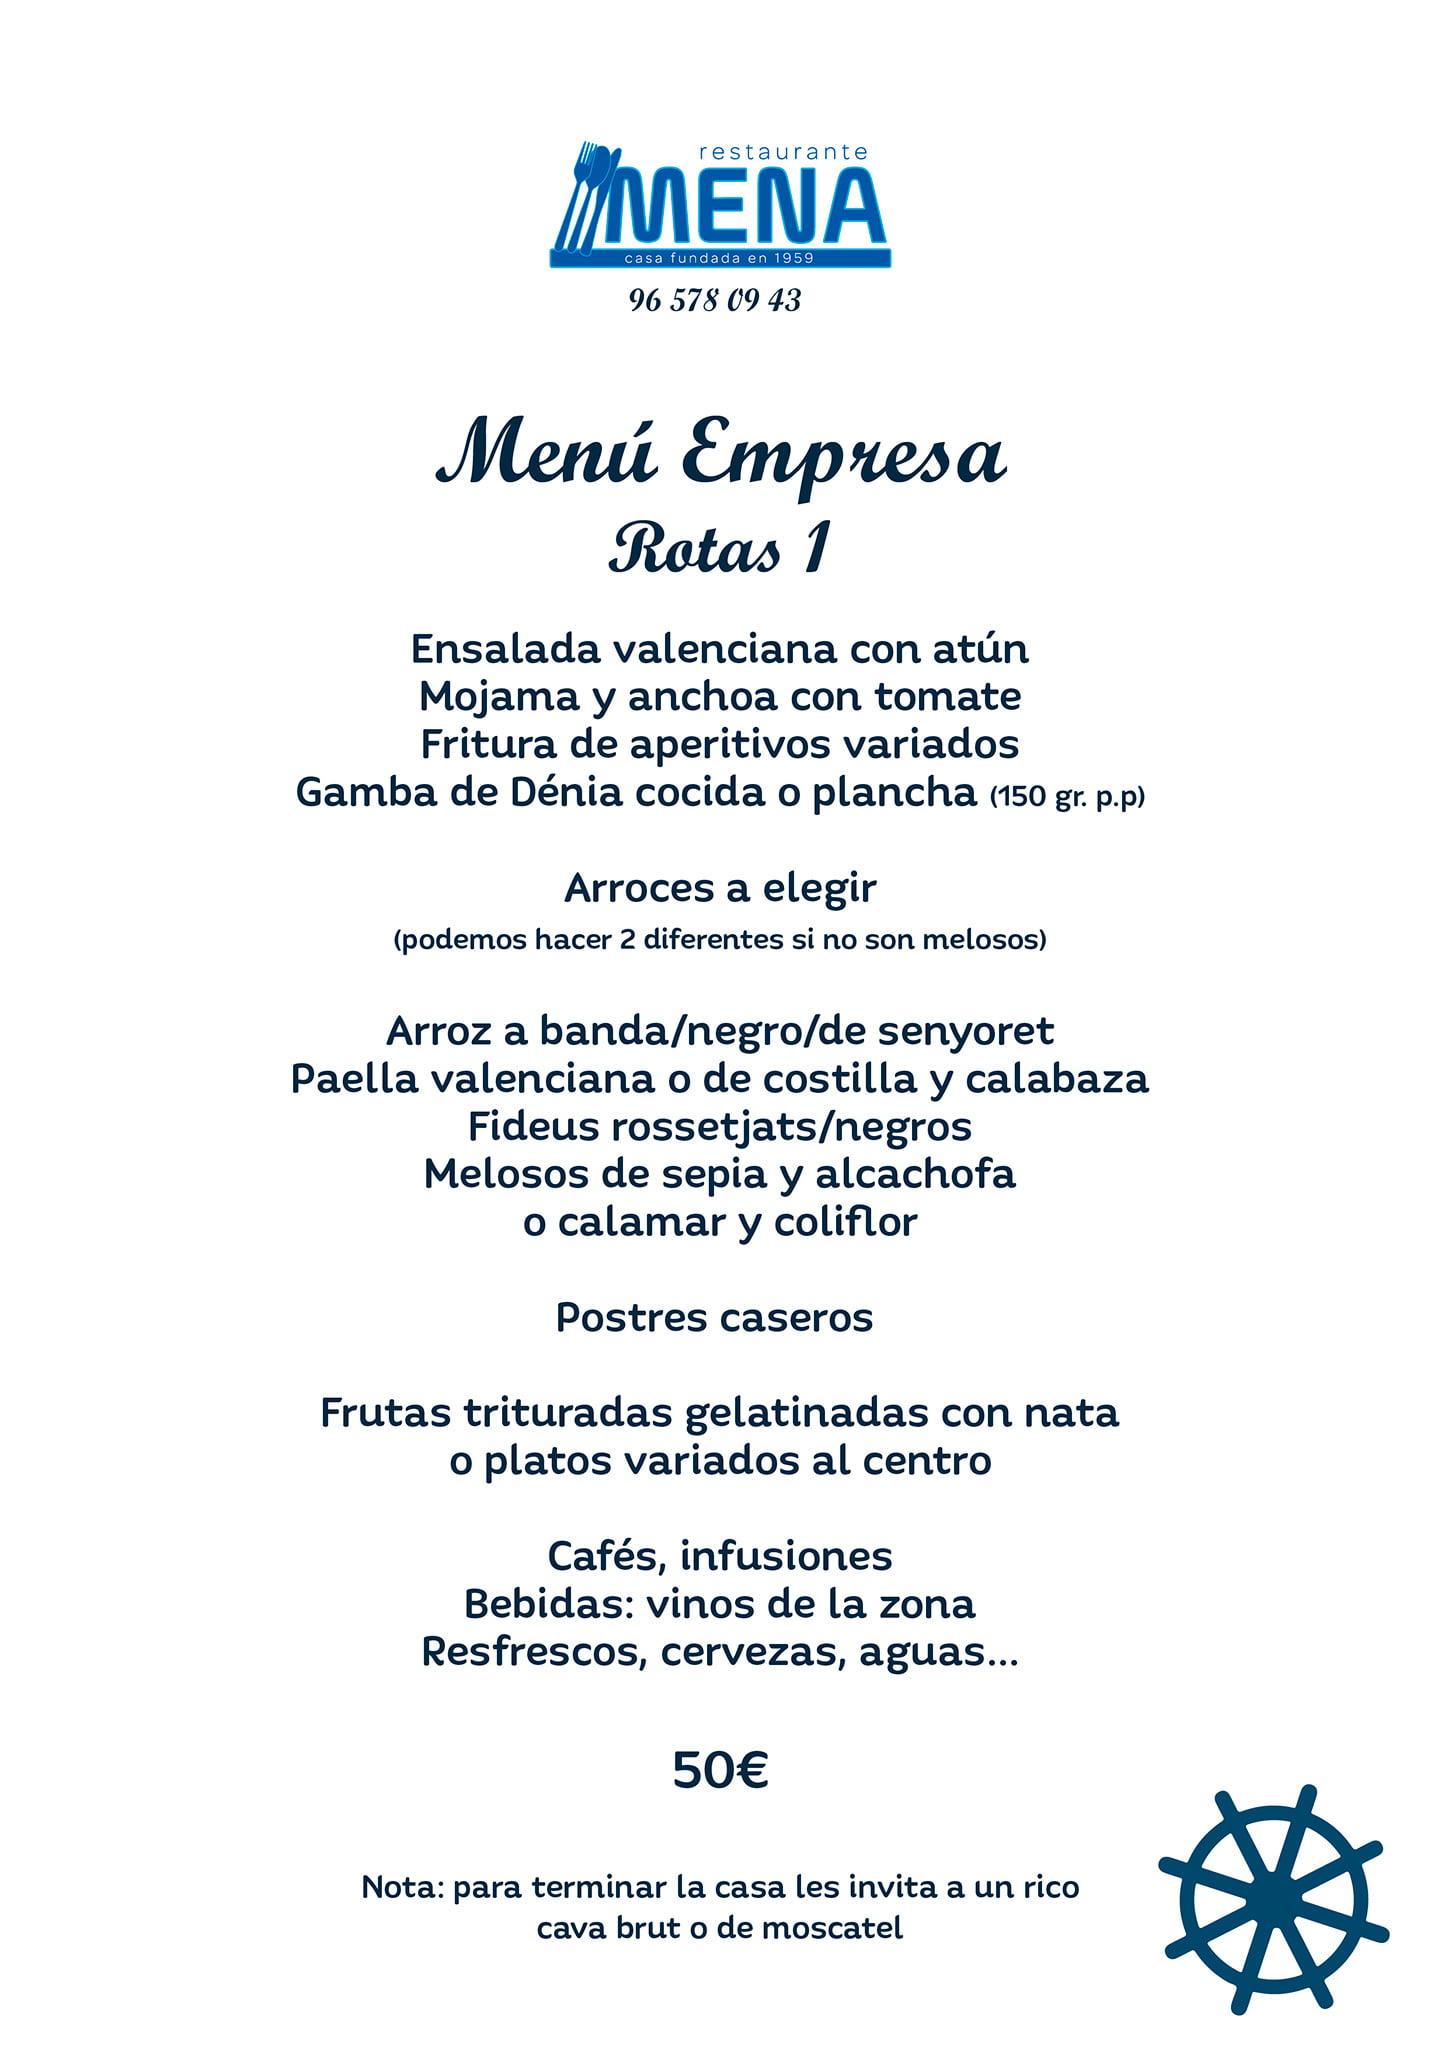 menù-de-società-the-broken-1-ristorante-mena